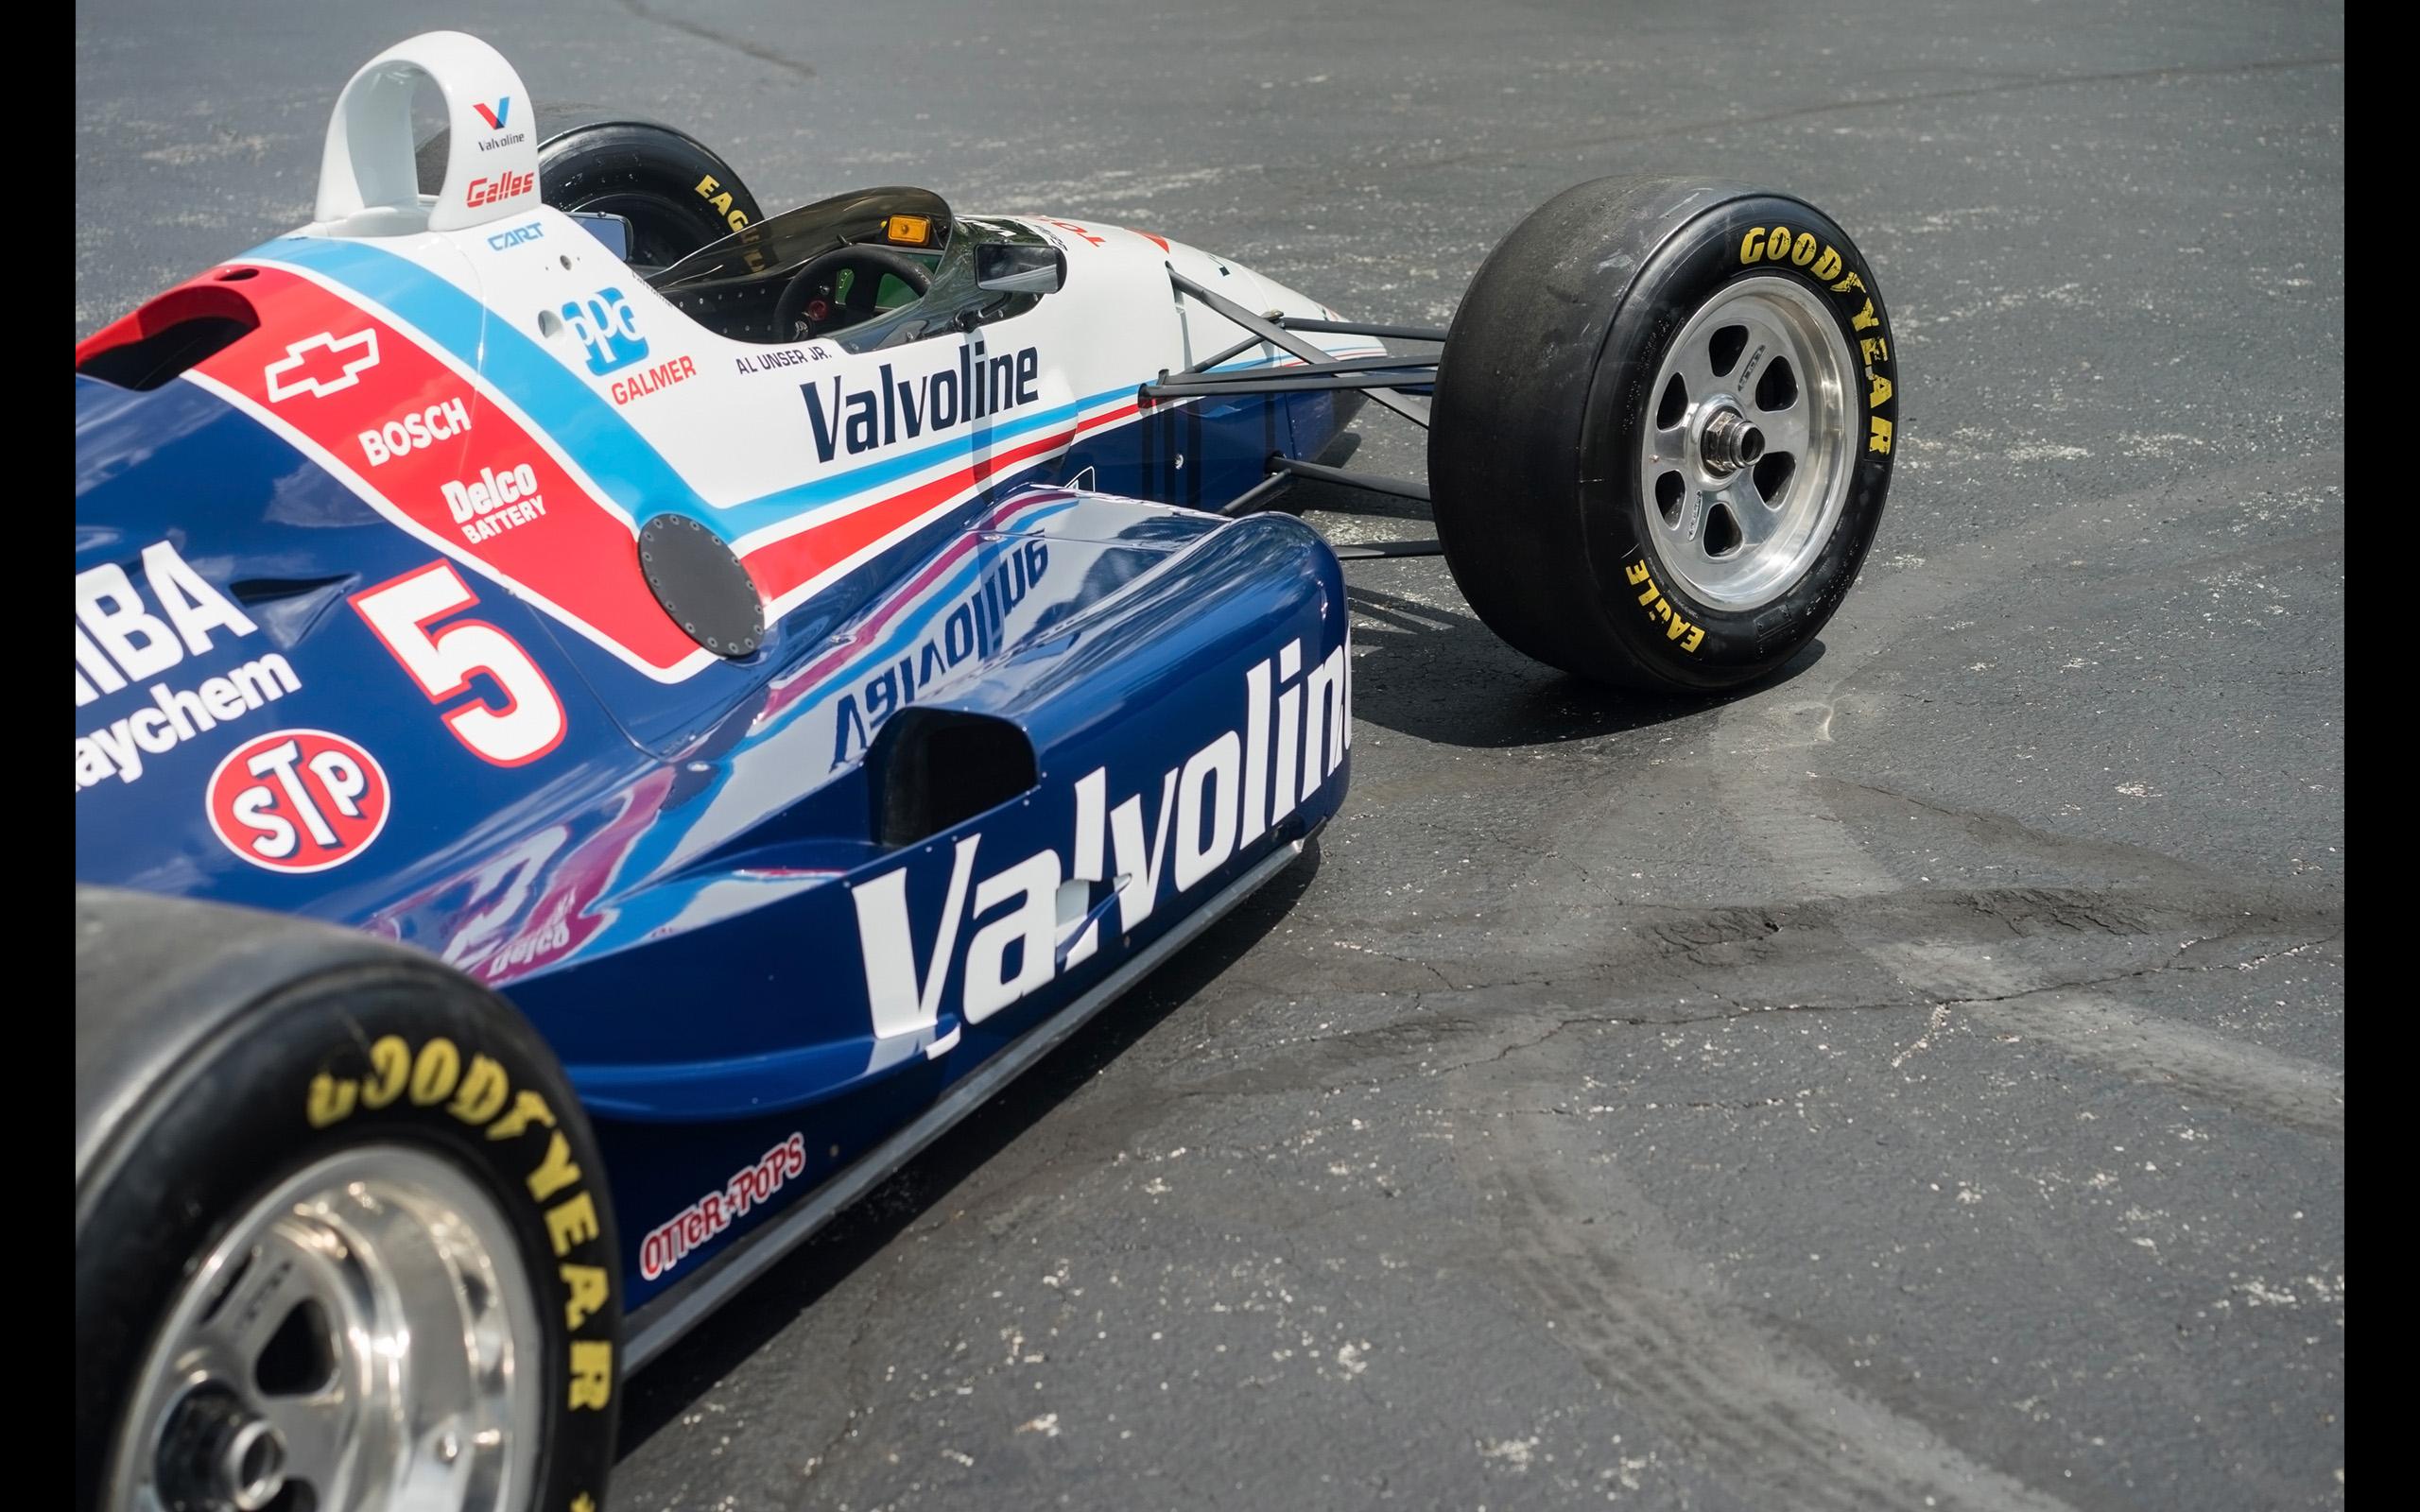 1990 Lola T9000 Valvoline Indy Car   Details   3   2560x1600 2560x1600